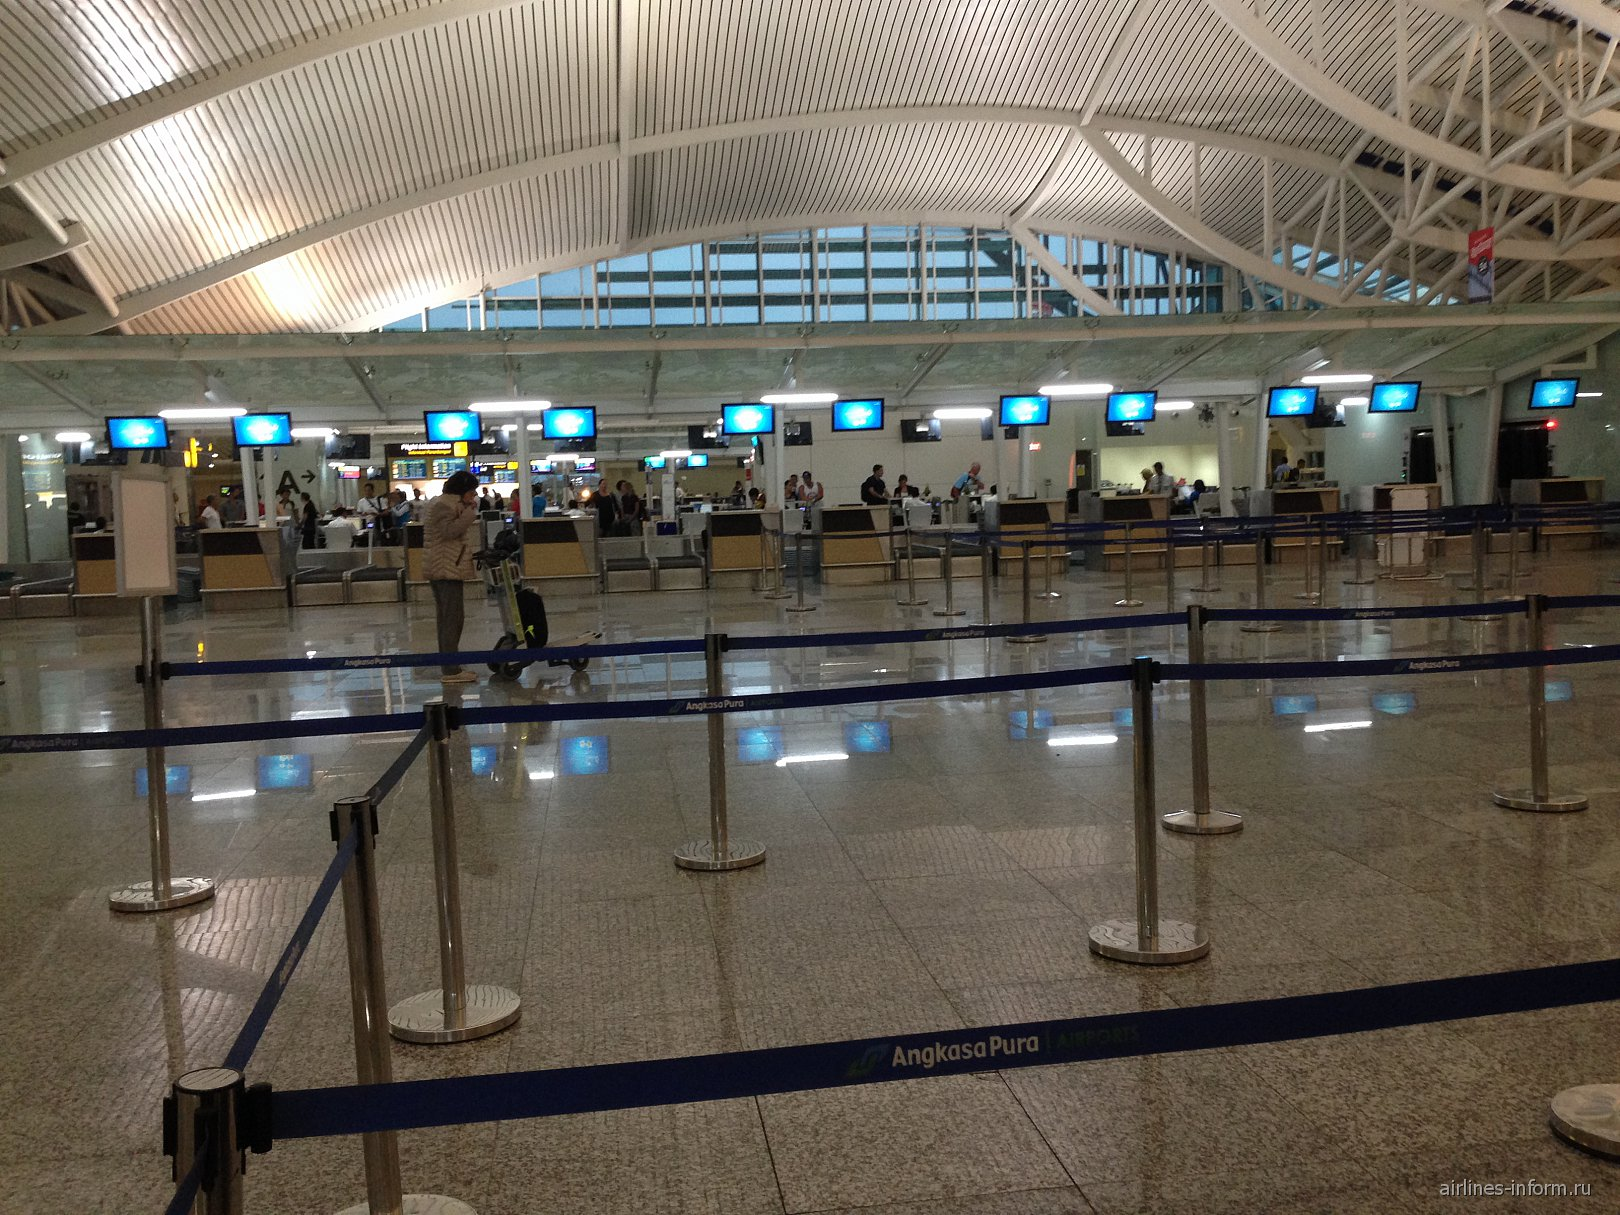 Стойки регистрации в аэропорту Денпасар Нгура Рай